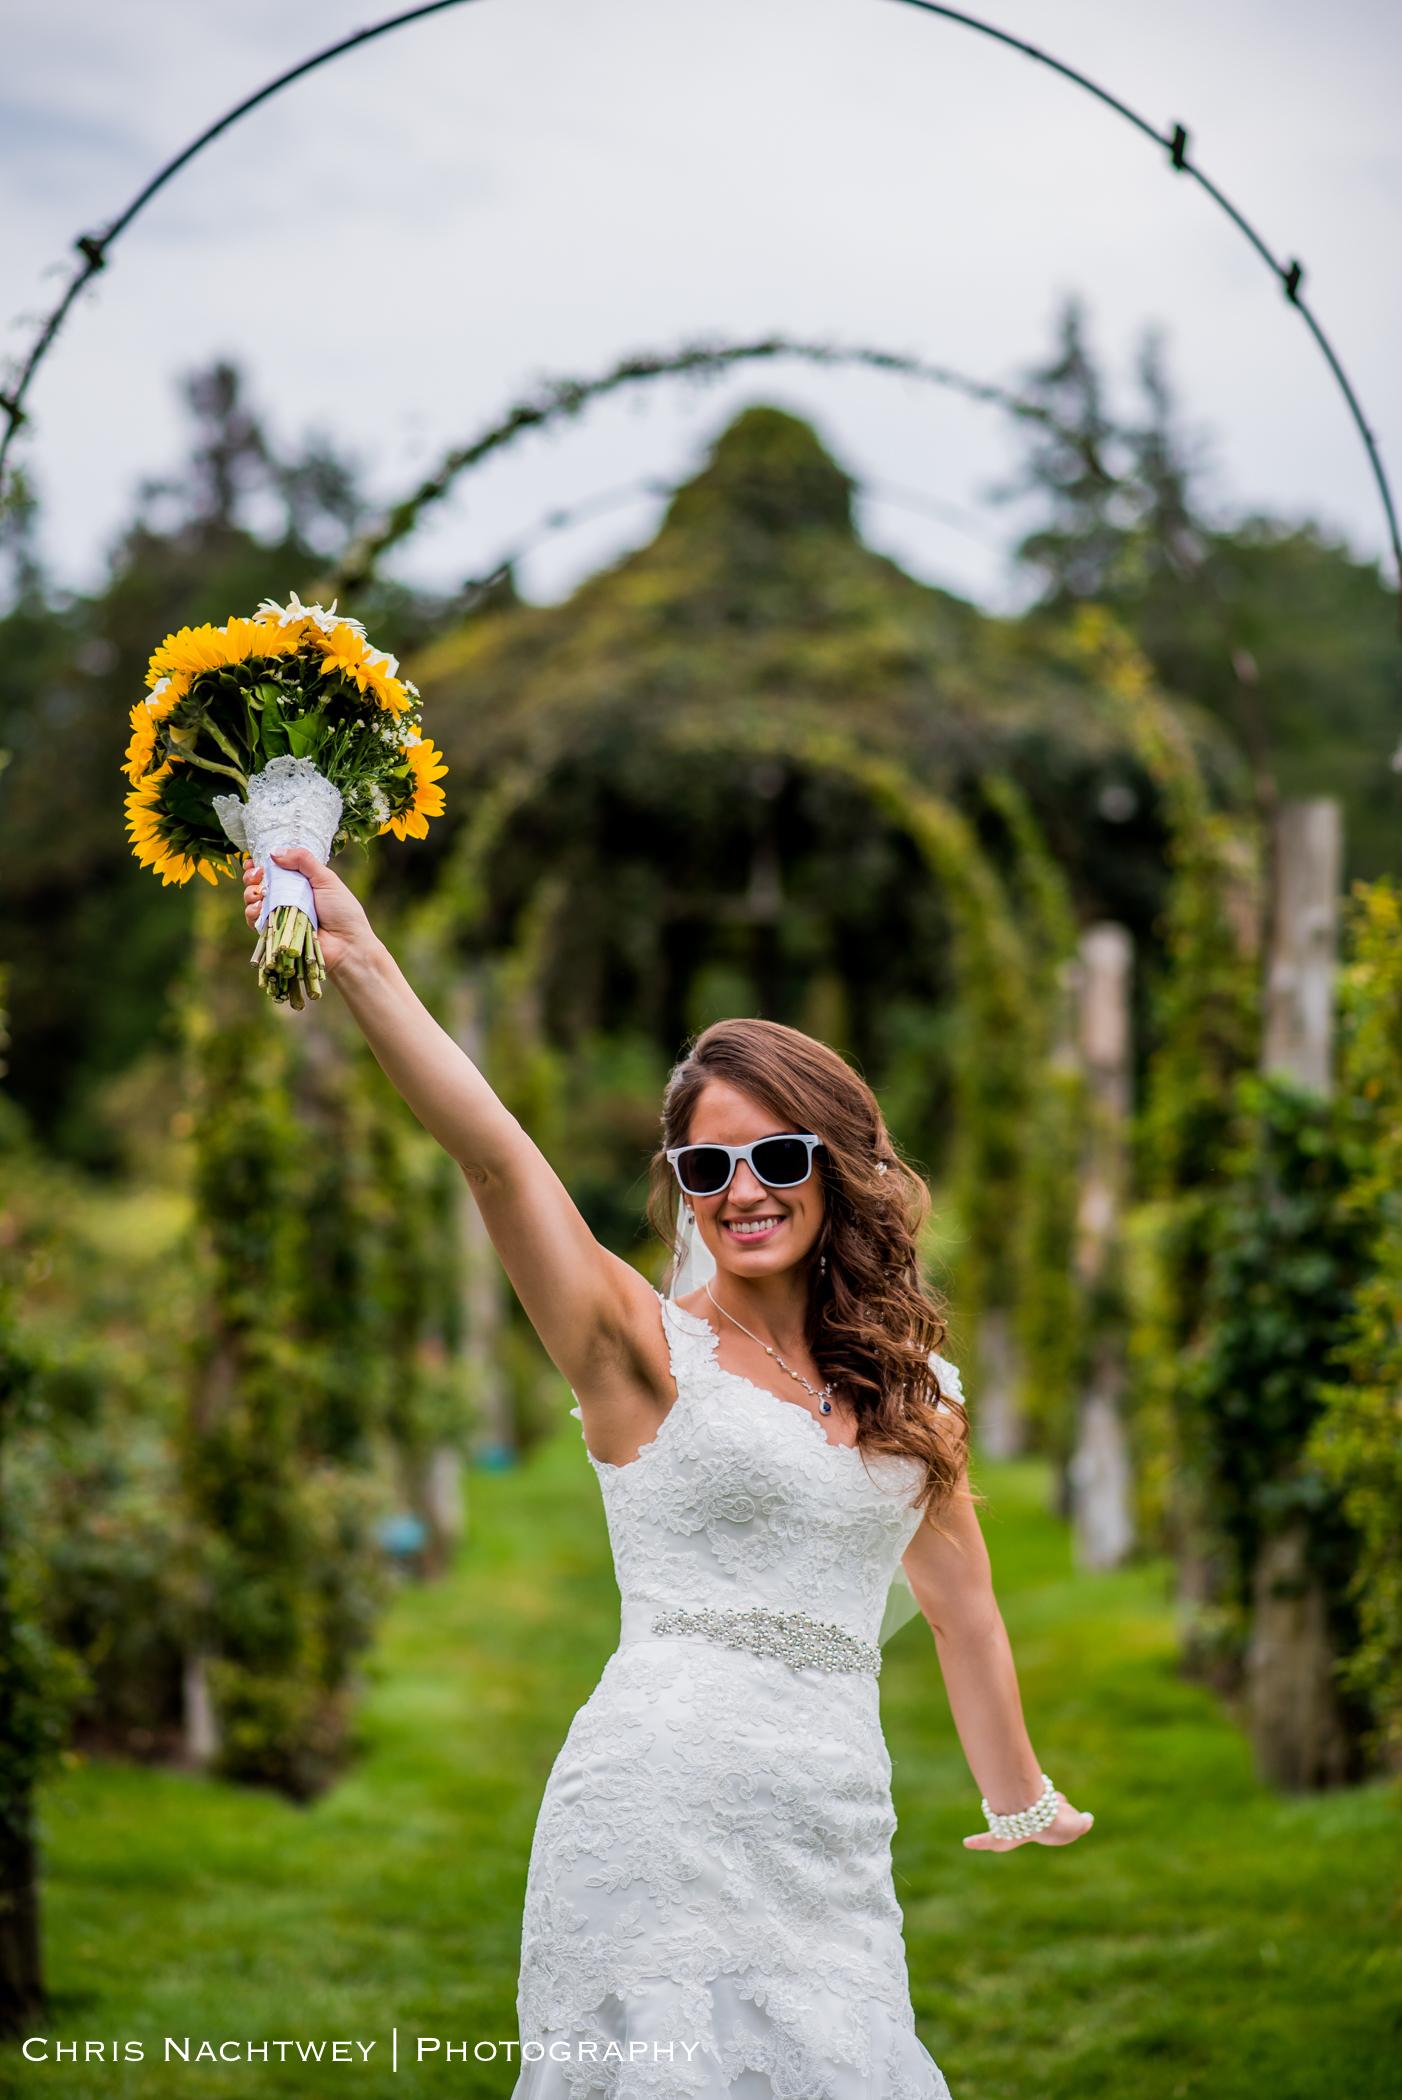 artistic-ct-wedding-photographers-chris-nachtwey-2017-53.jpg